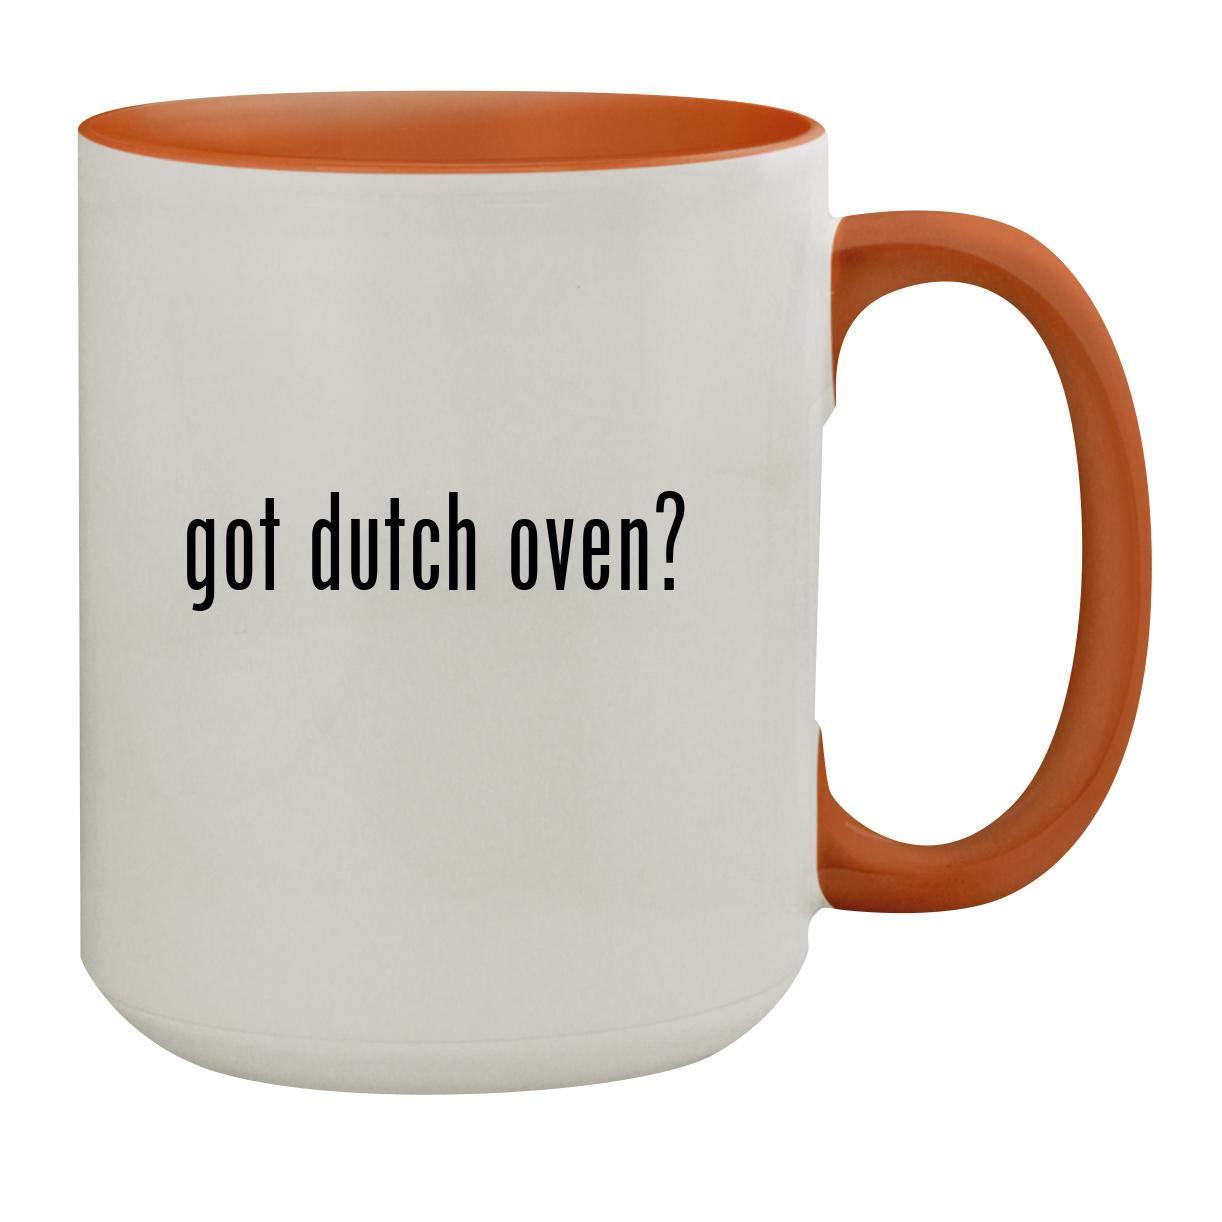 got dutch oven? - 15oz Colored Inner & Handle Ceramic Coffee Mug, Orange